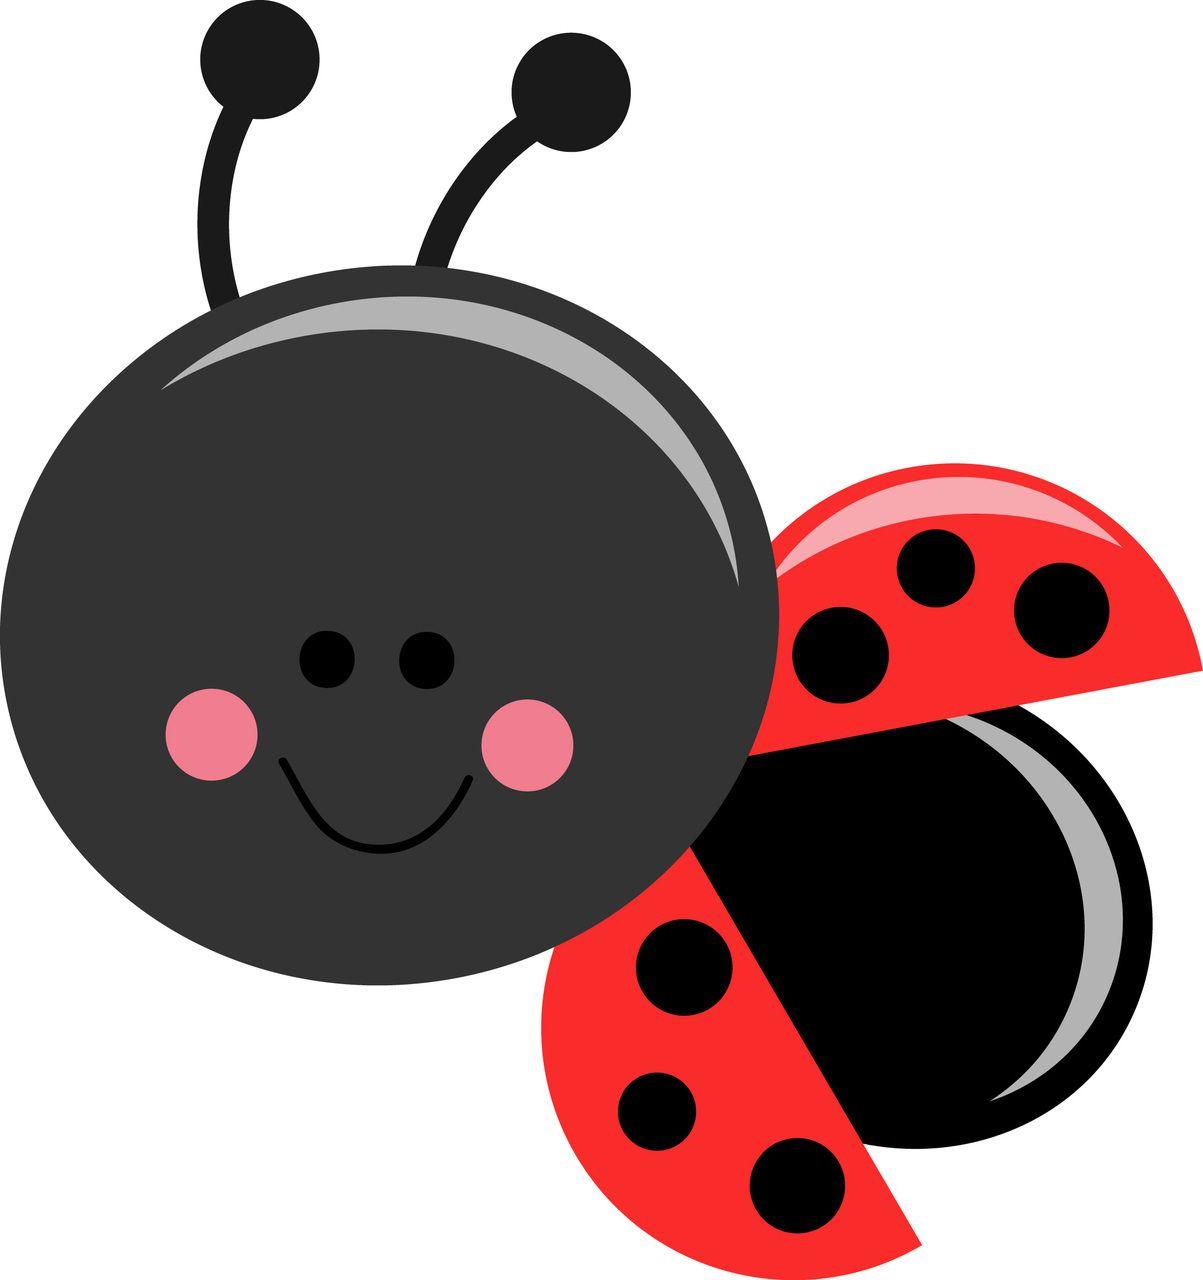 ladybug graphics.